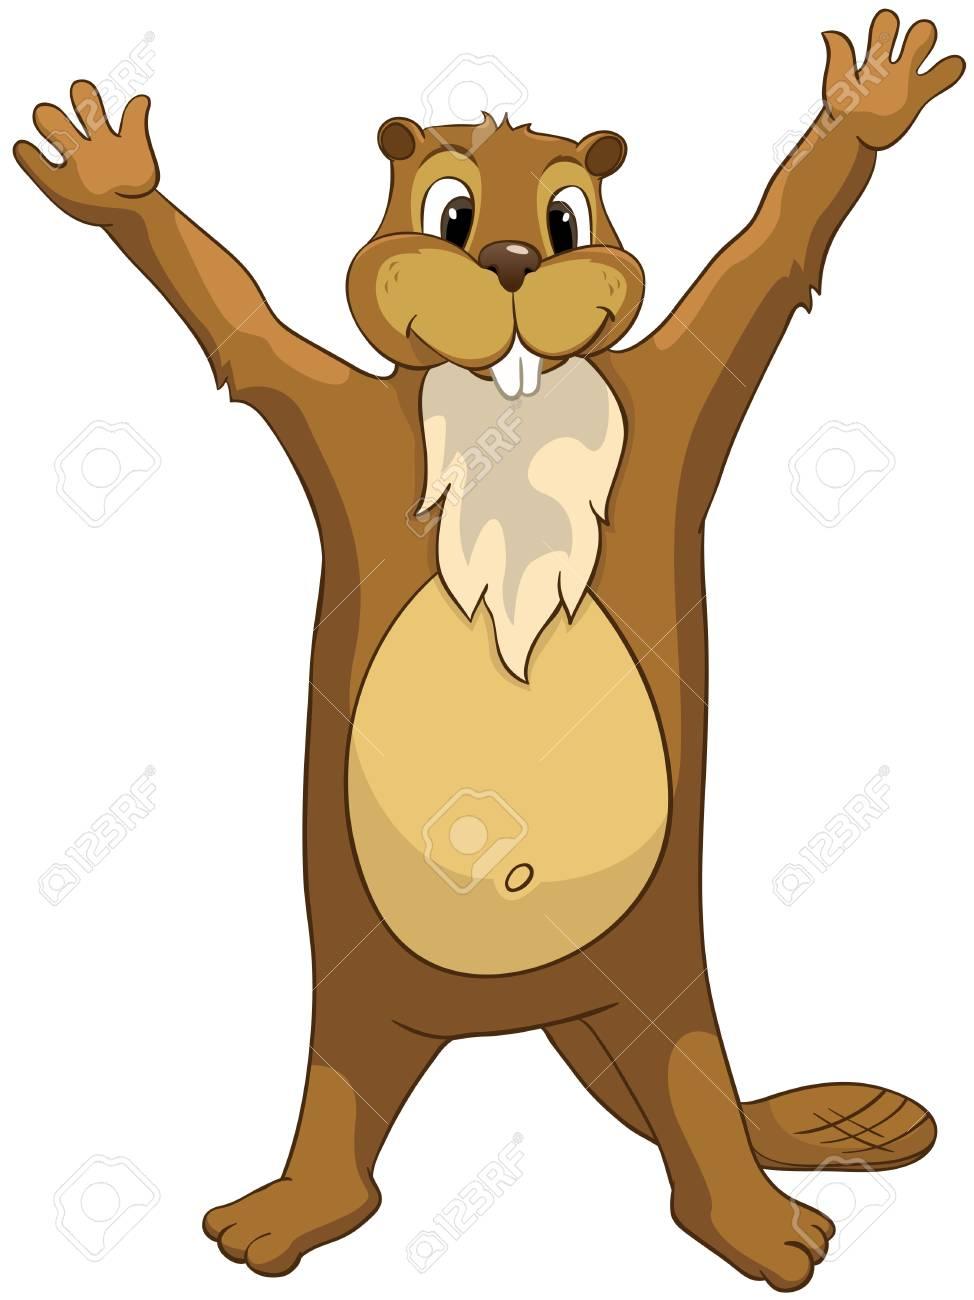 Beaver CREES Stock Vector - 12996718